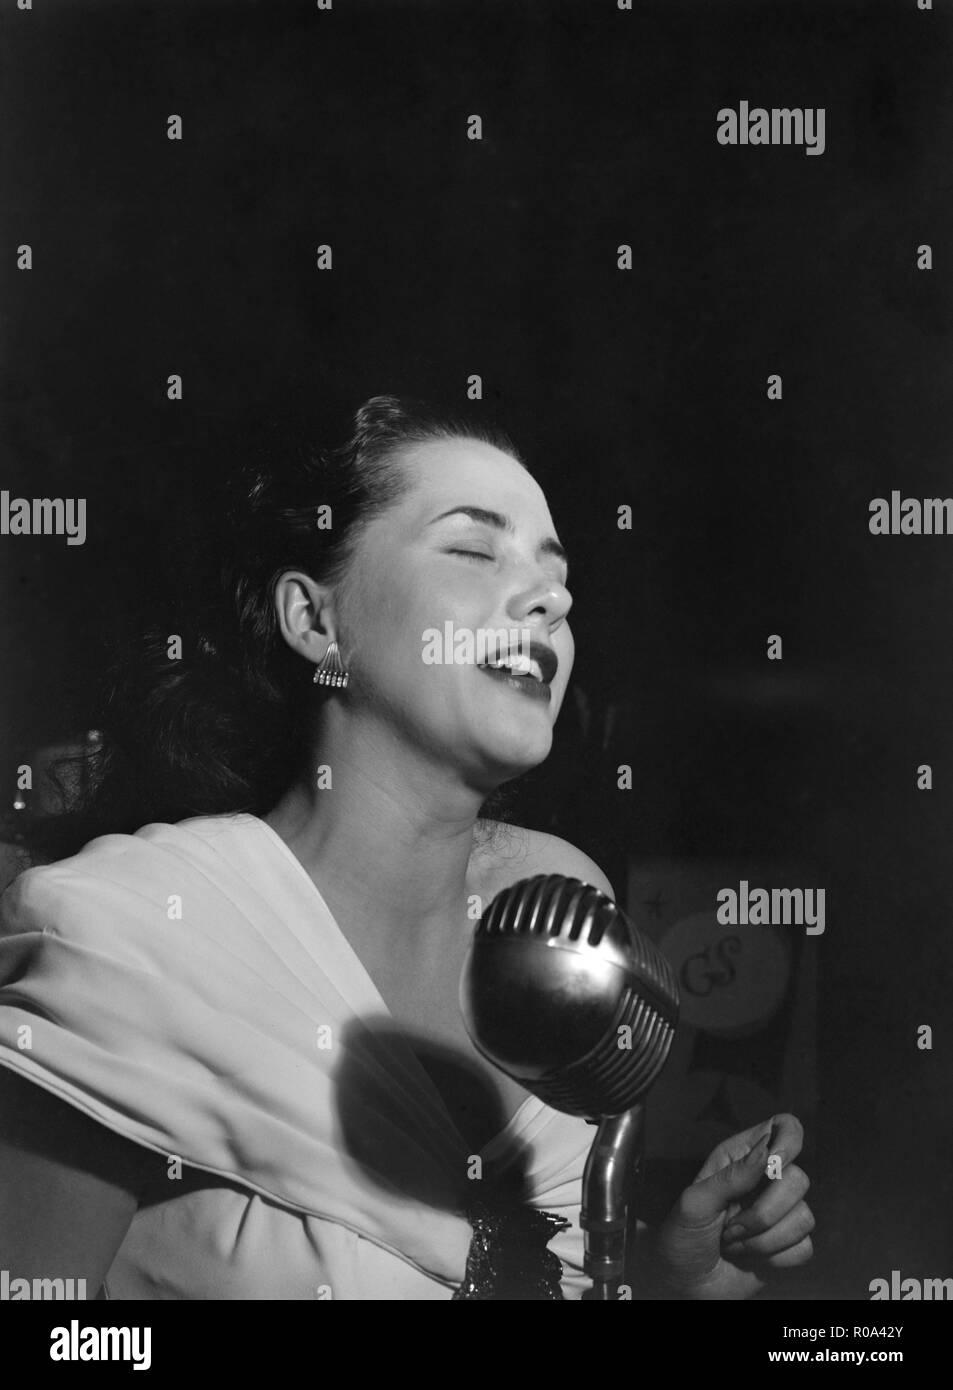 Jazz Singer Ann Hathaway, Café Society, New York City, New York, USA, William P. Gottlieb Collection, 1946 Stock Photo